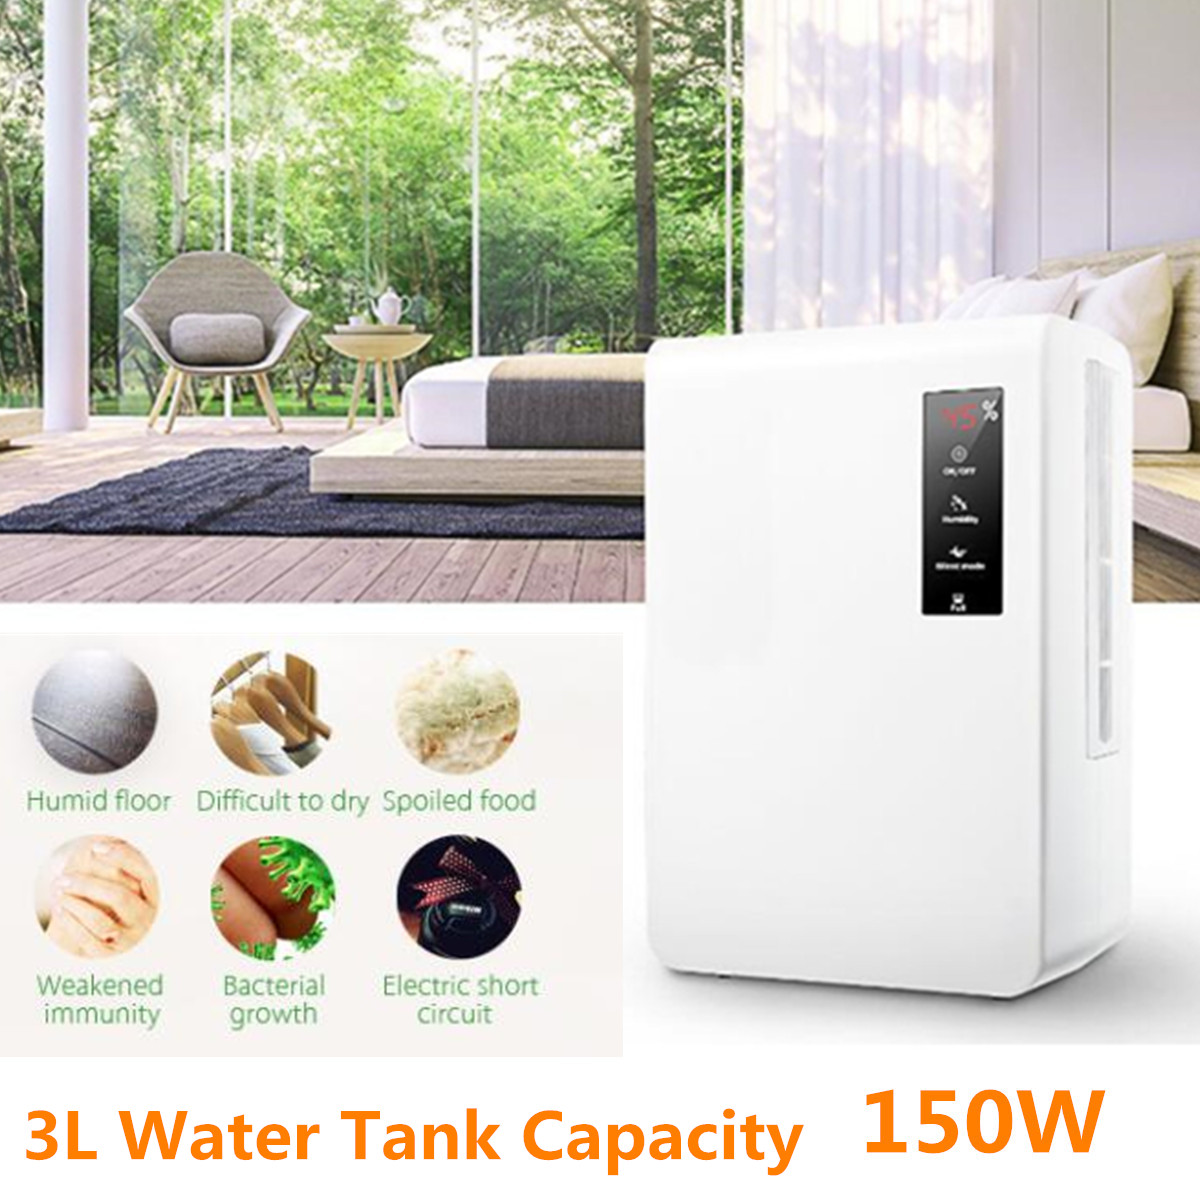 AX3 3L 150W Dehumidifier Home Dehumidifier Mute Bedroom Basement Moisture in Home Kitchen Bathroom Basement Absorption Dryer